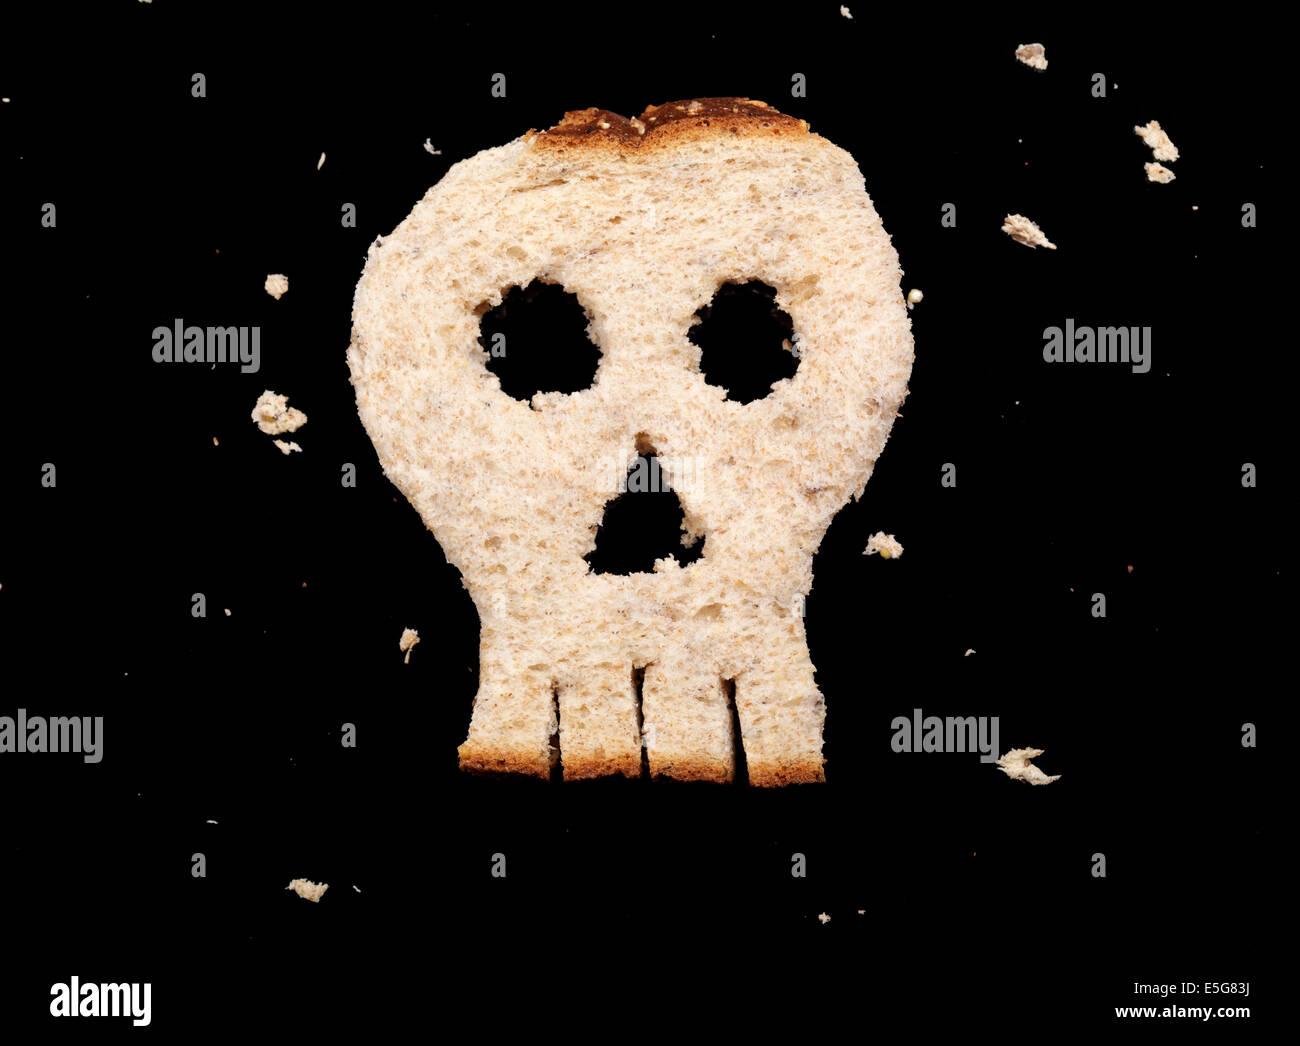 Cráneo hecha de pan aislado sobre fondo negro Imagen De Stock